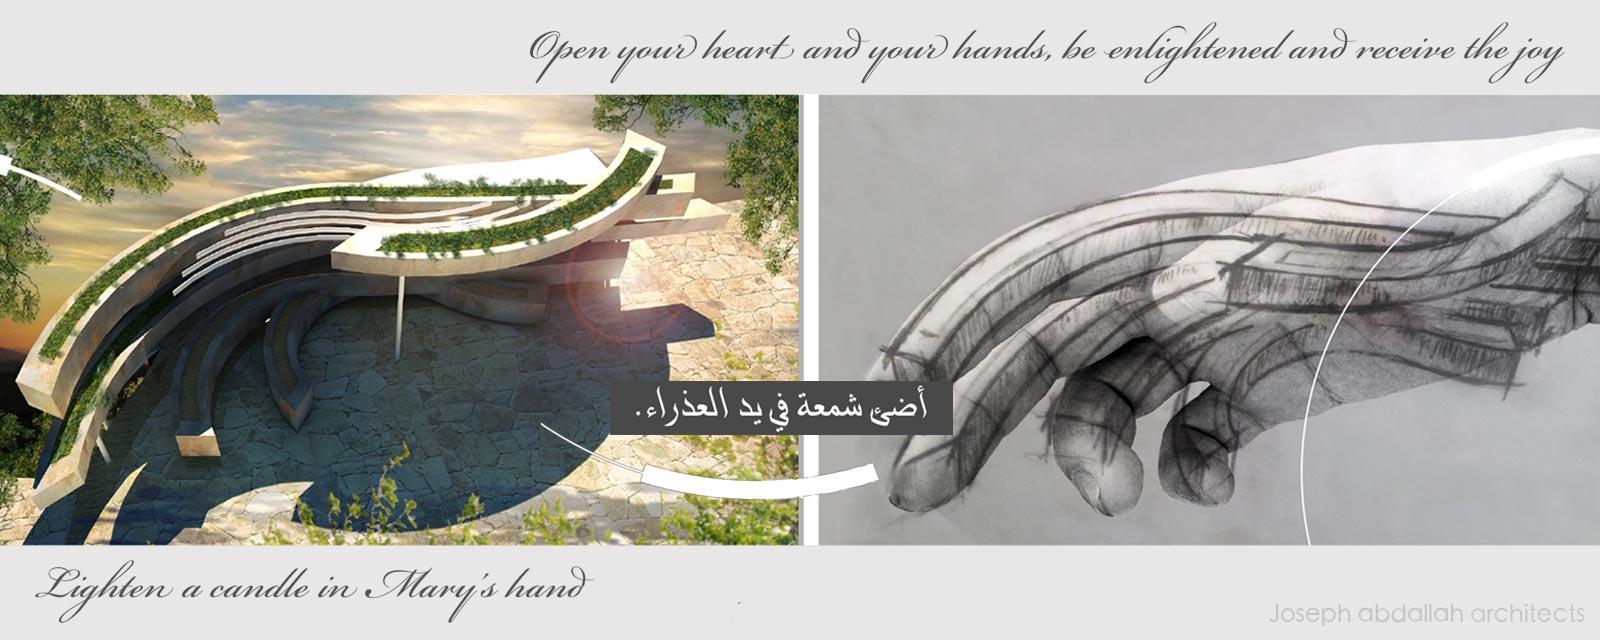 harissa-notre-dame-of-lebanon-shrink-architecture-joseph-abdallah-architects-2g